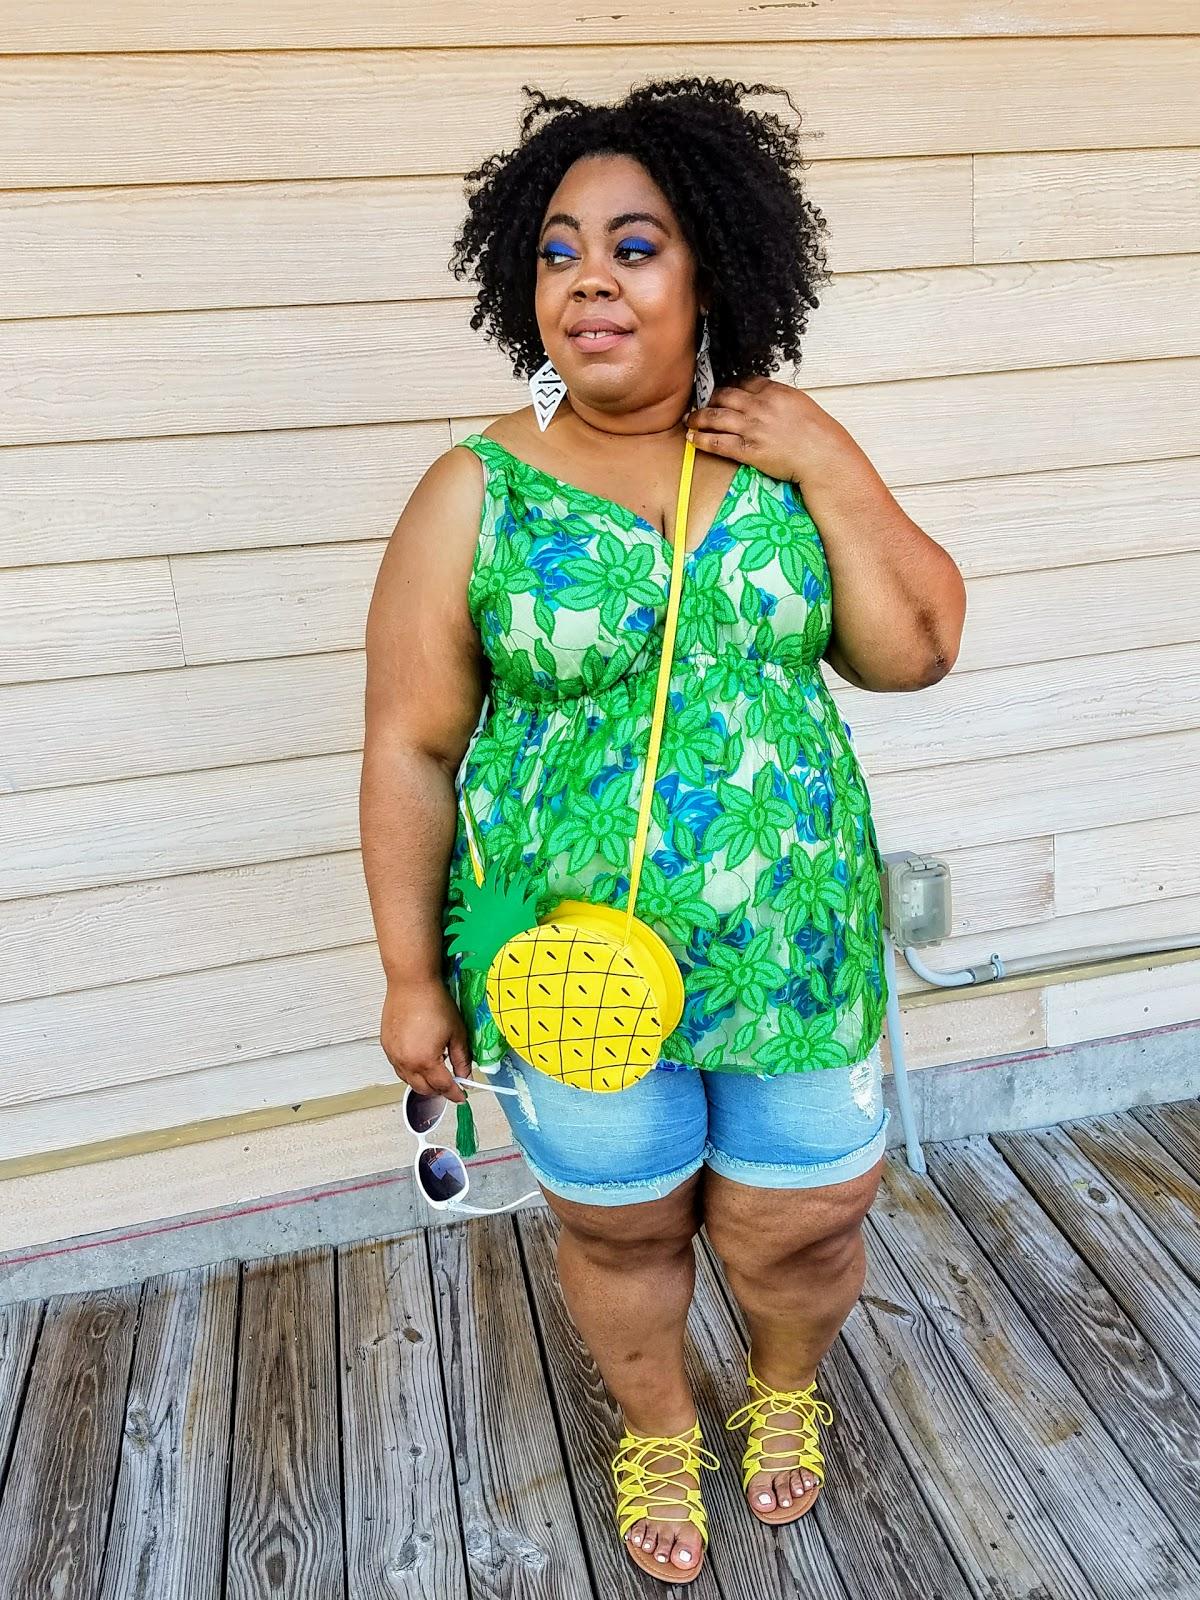 plus size, blogger, florals, shorts, sandals, crossbody purse, natural hair, bold makeup